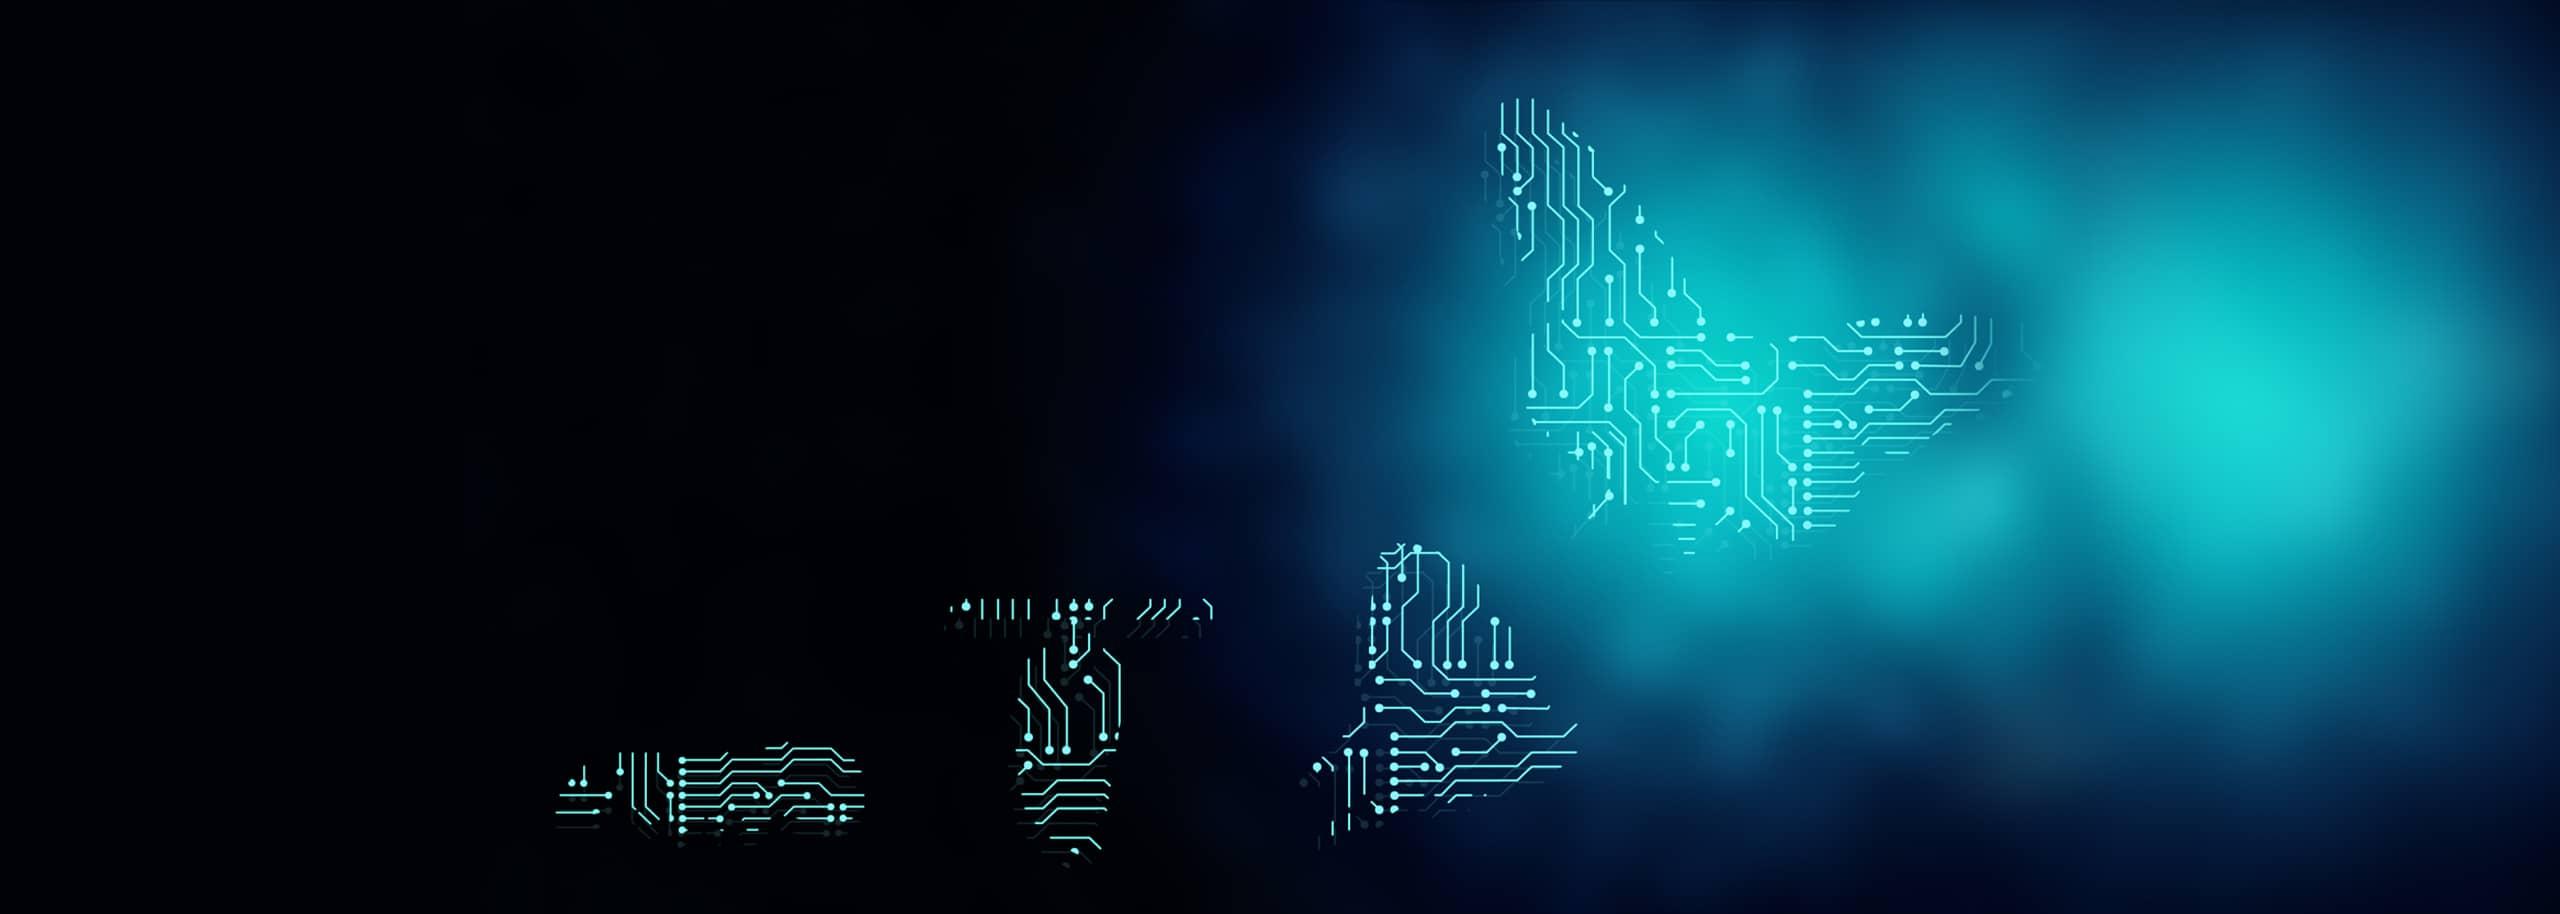 Digital transformation for a 4P logistics provider